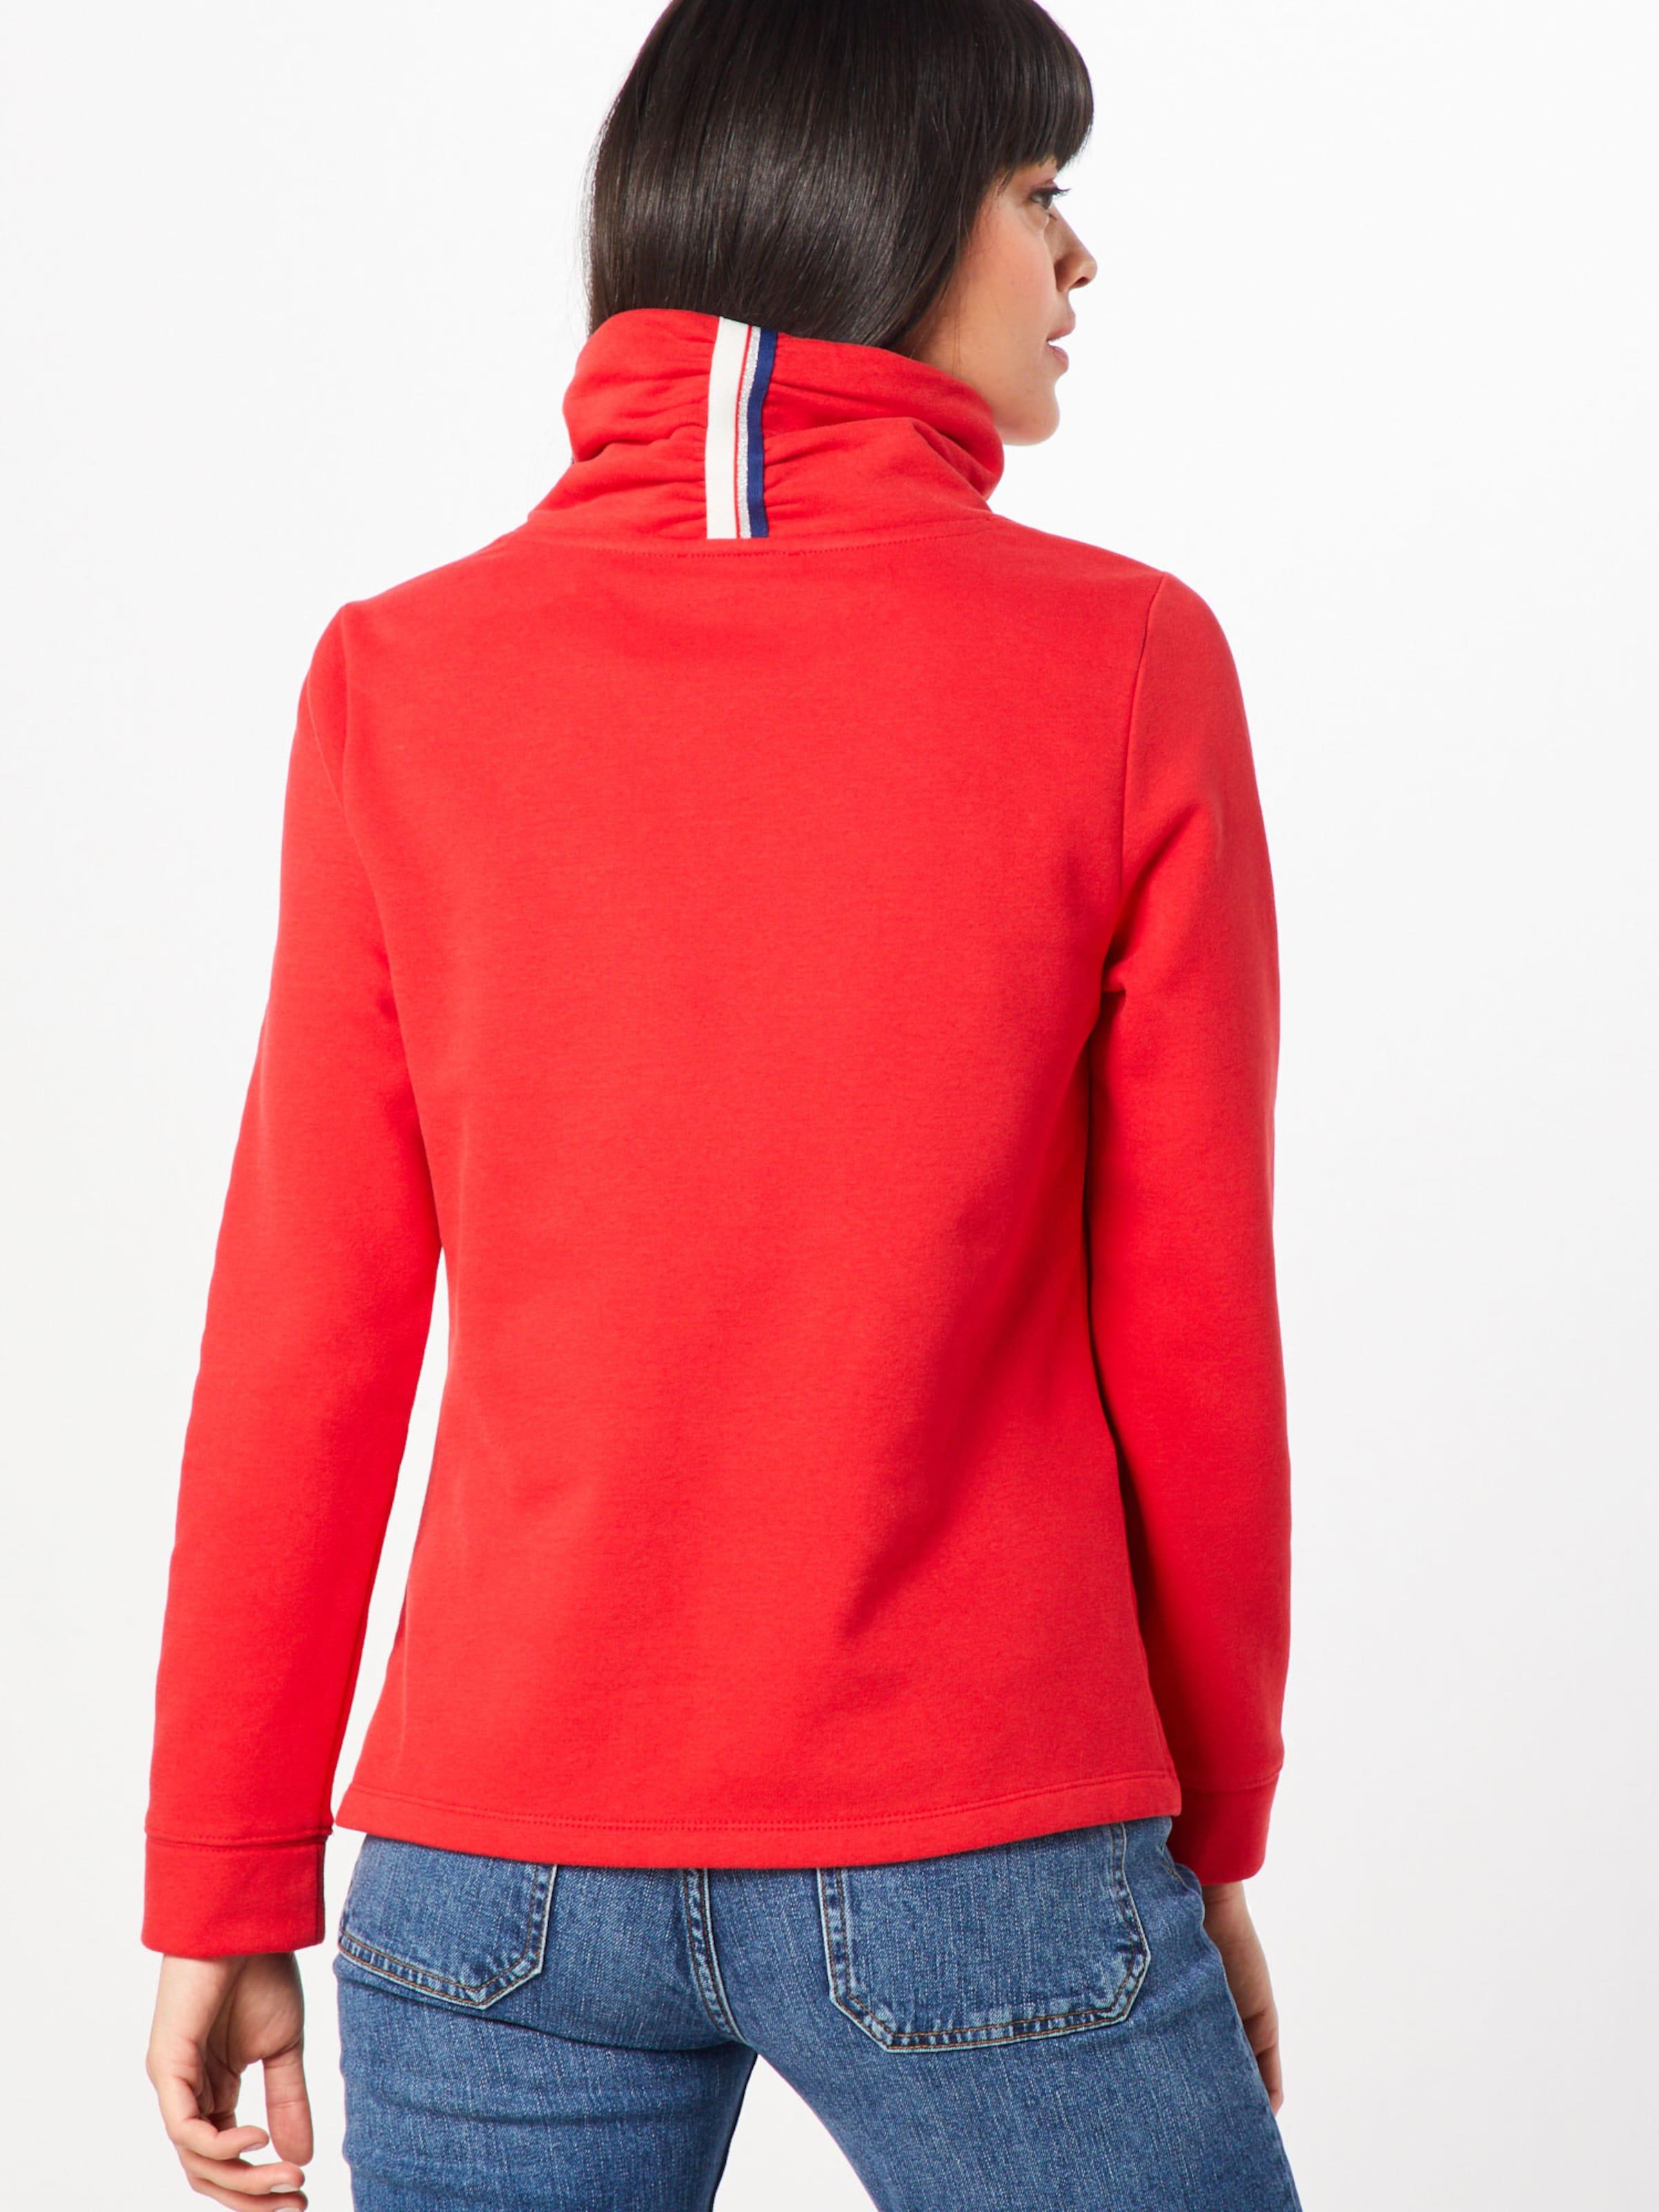 Red MarineJaune Blanc S oliver D'or shirt En Sweat Argent Label Bleu OPXkiuTZ